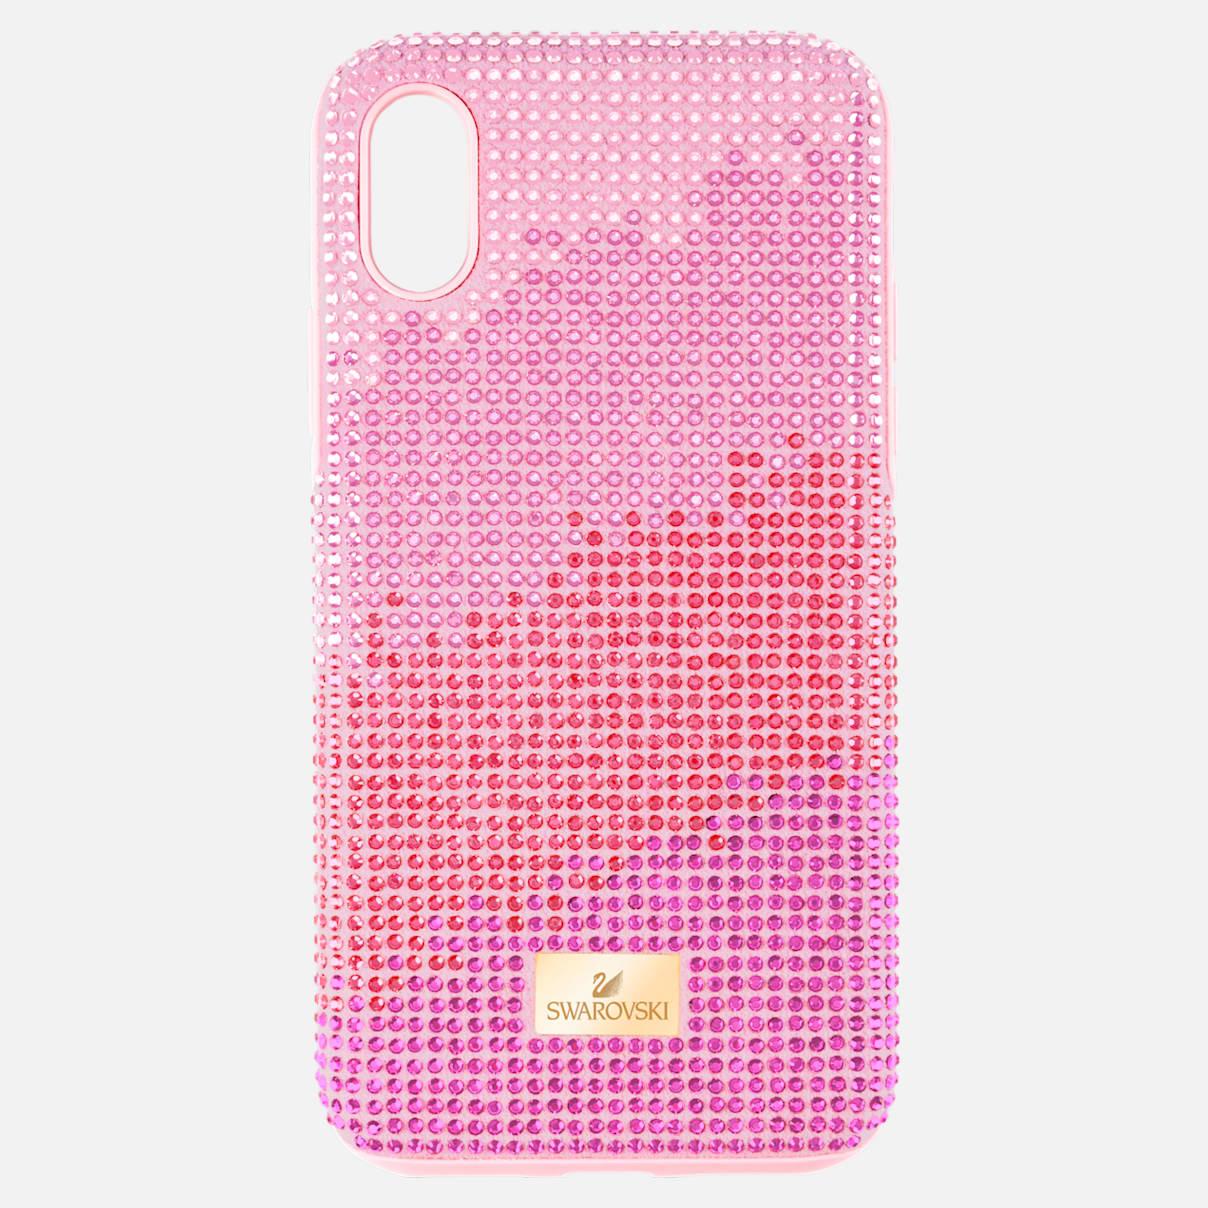 High Love Smartphone Schutzhülle mit Stoßschutz, iPhone® XR, rosa